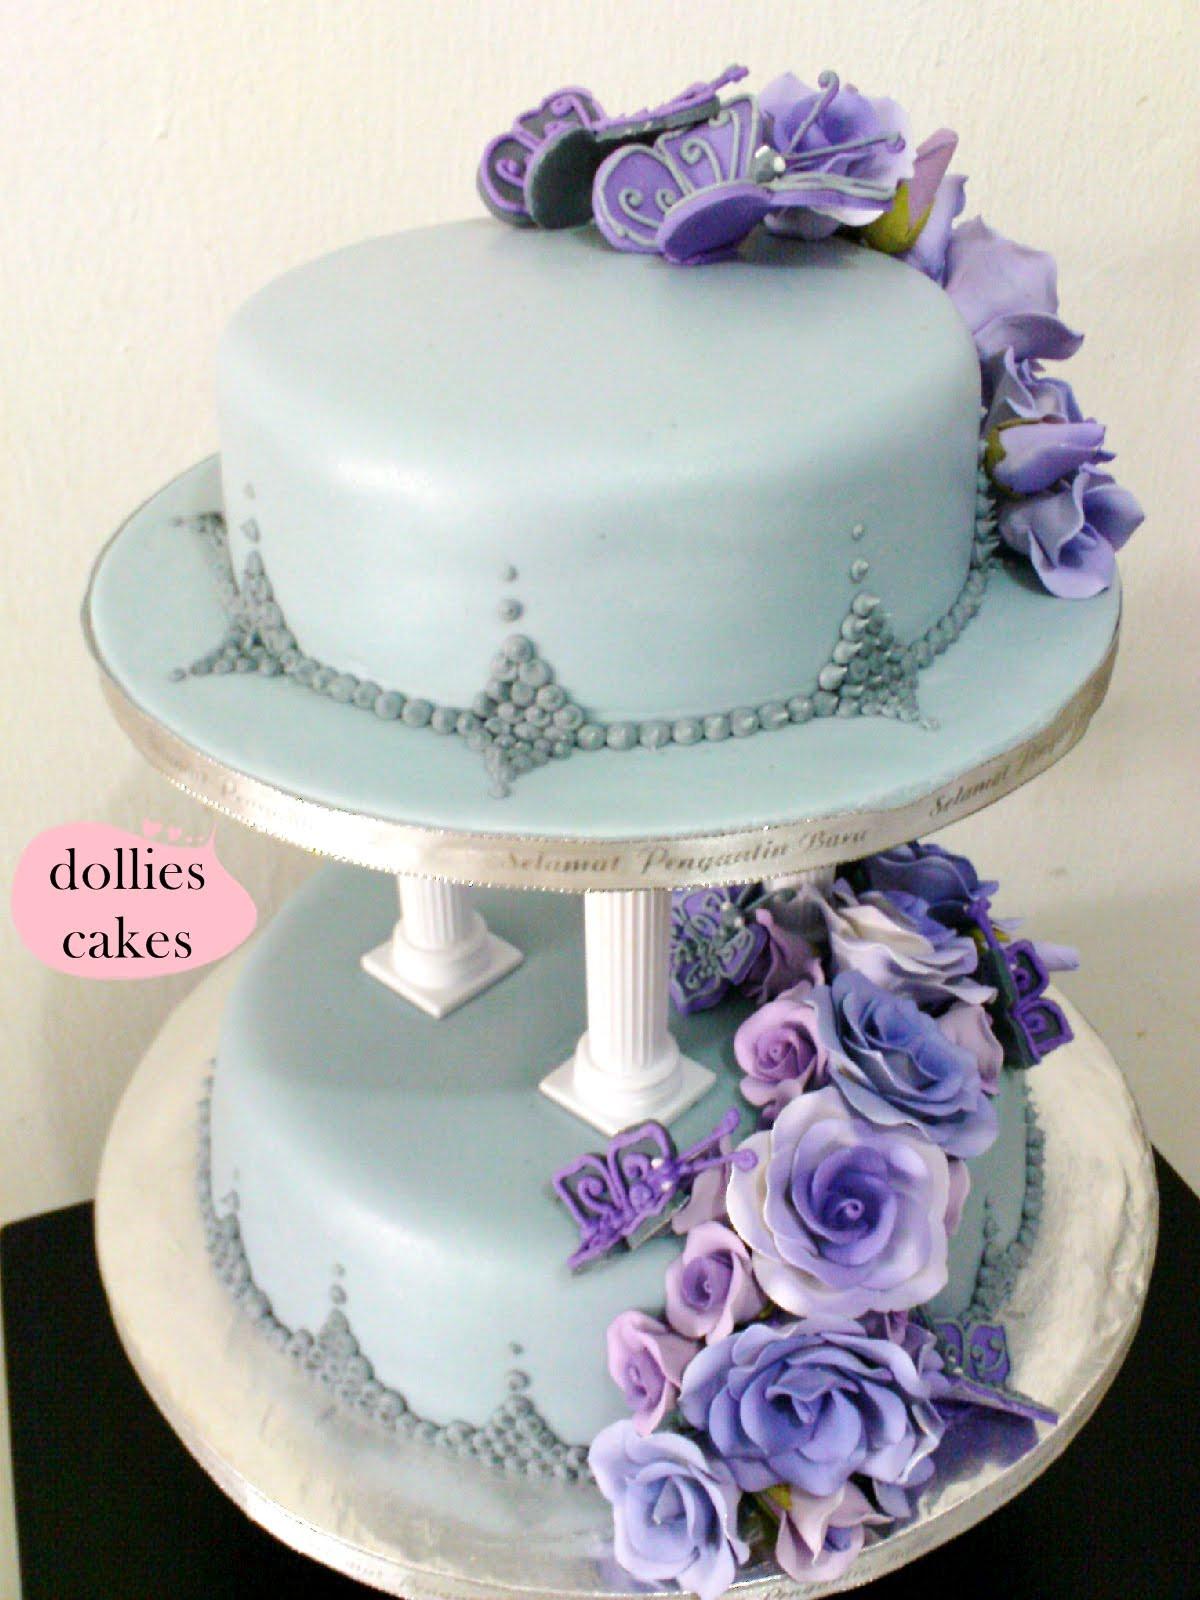 Purple And Grey Wedding Cakes  dollies cakes purple grey wedding cakes